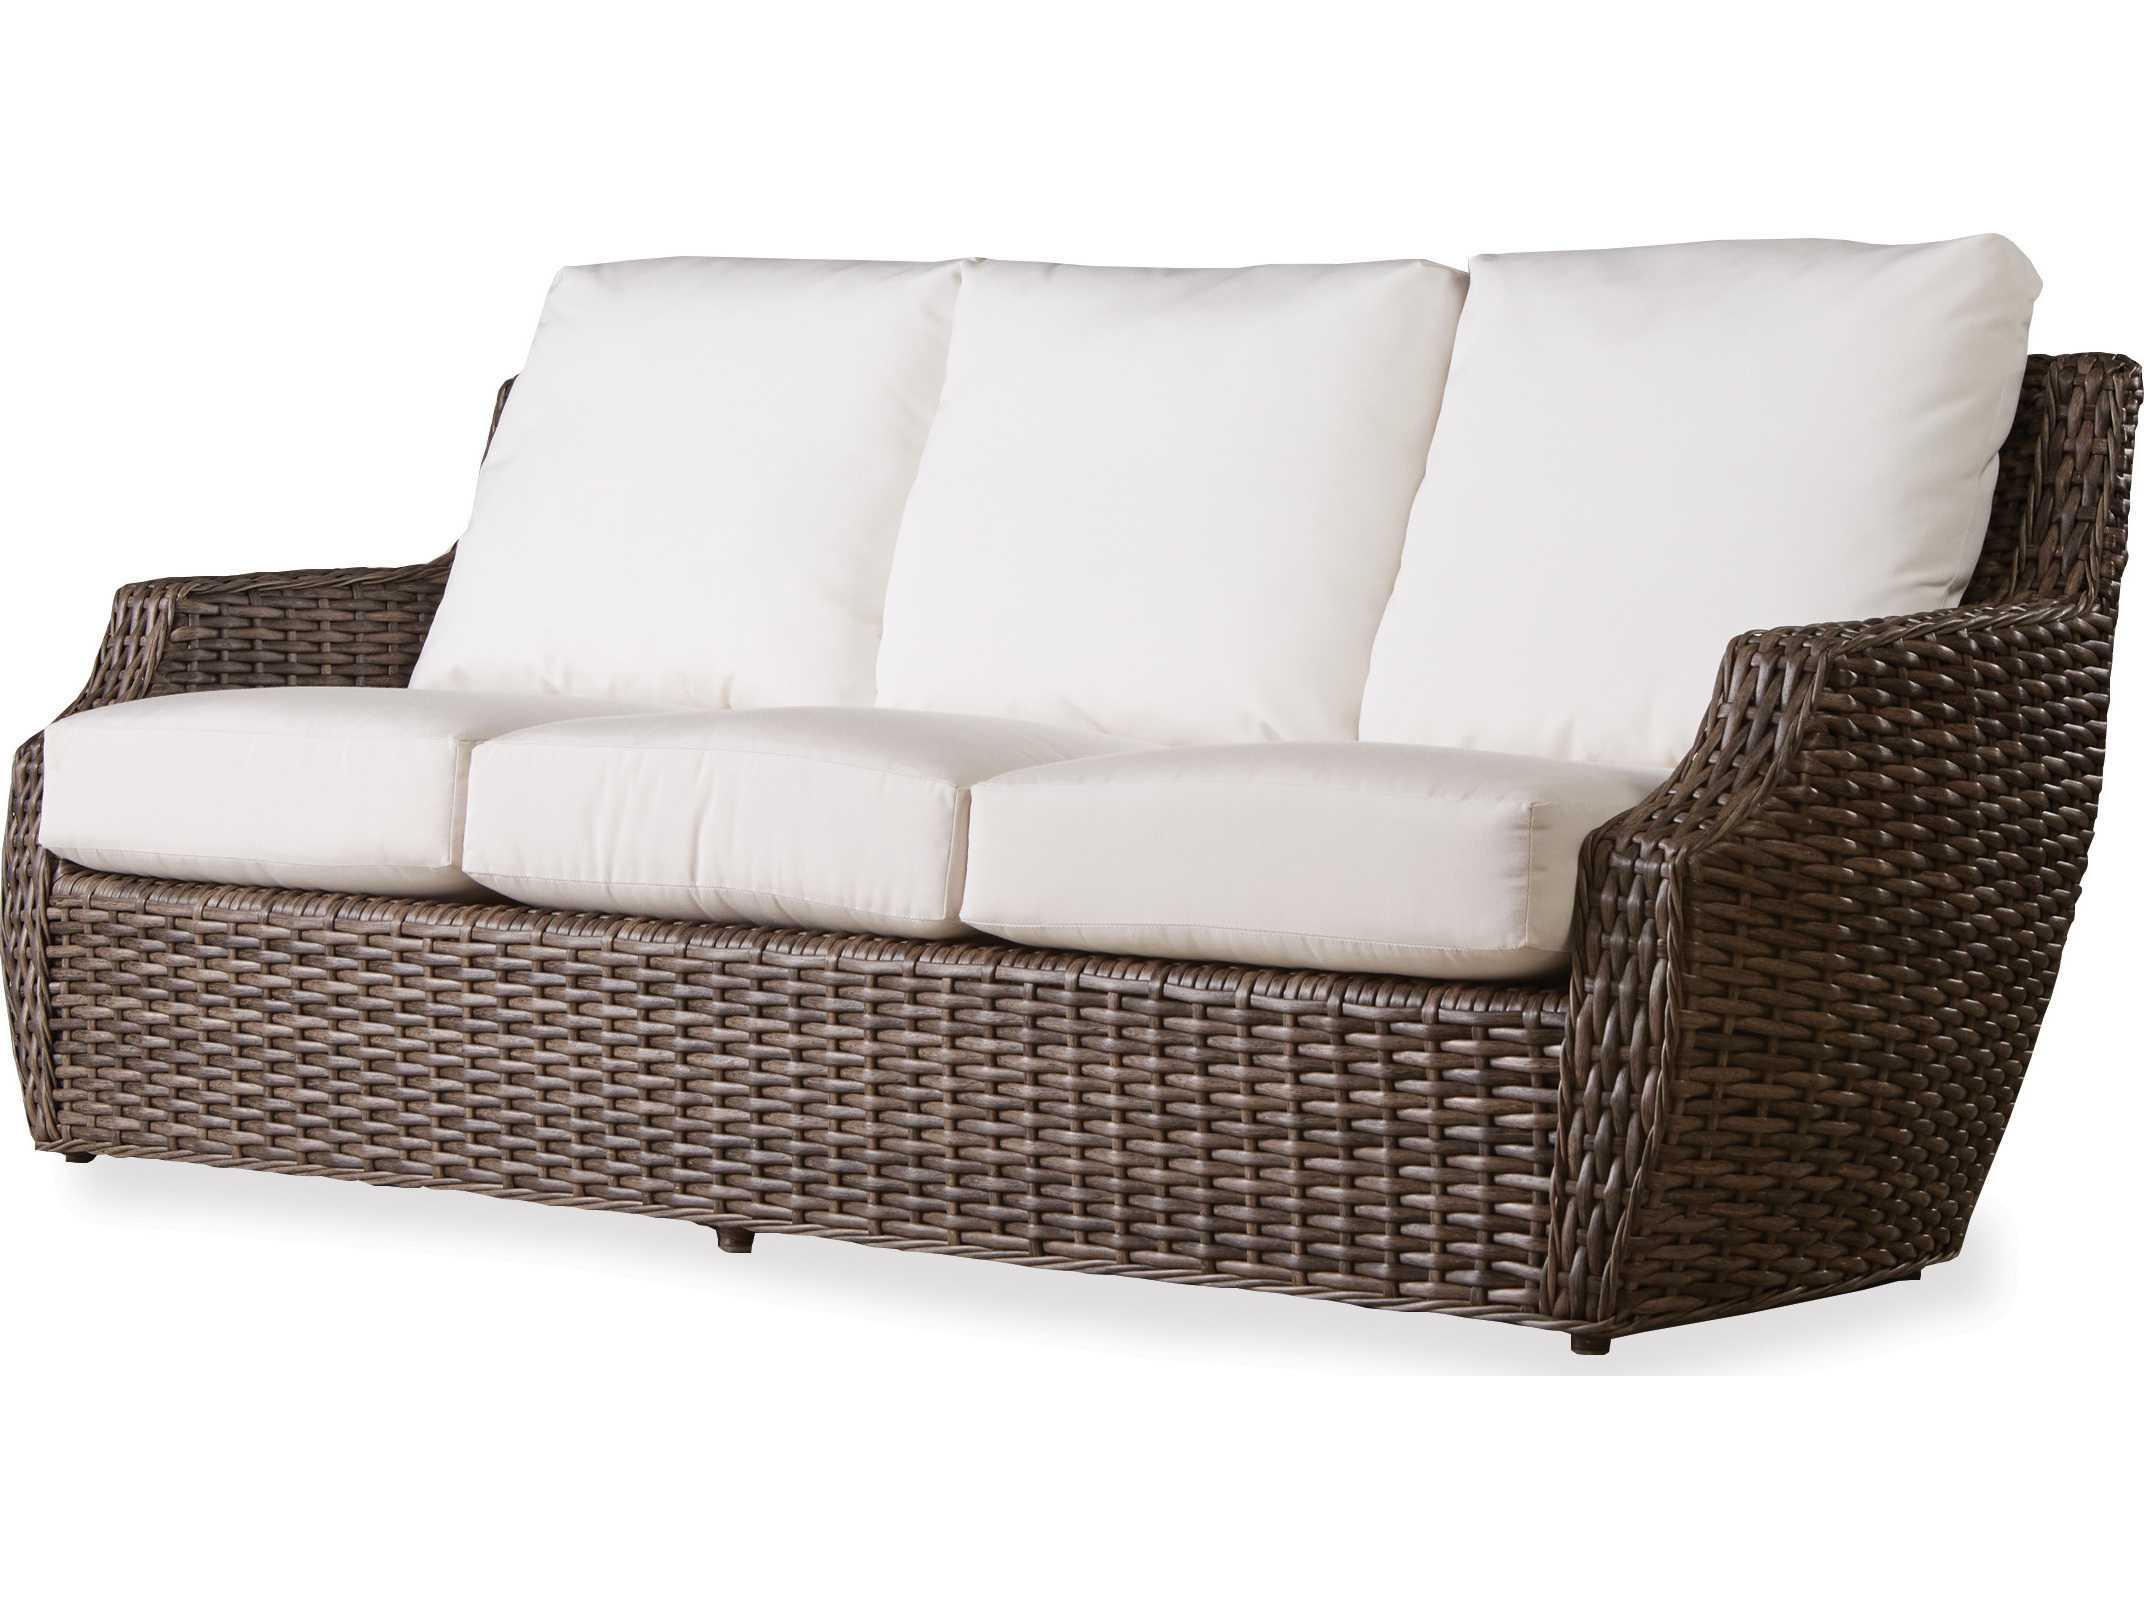 Lloyd Flanders Largo Replacement Sofa Seat Cushion 241955